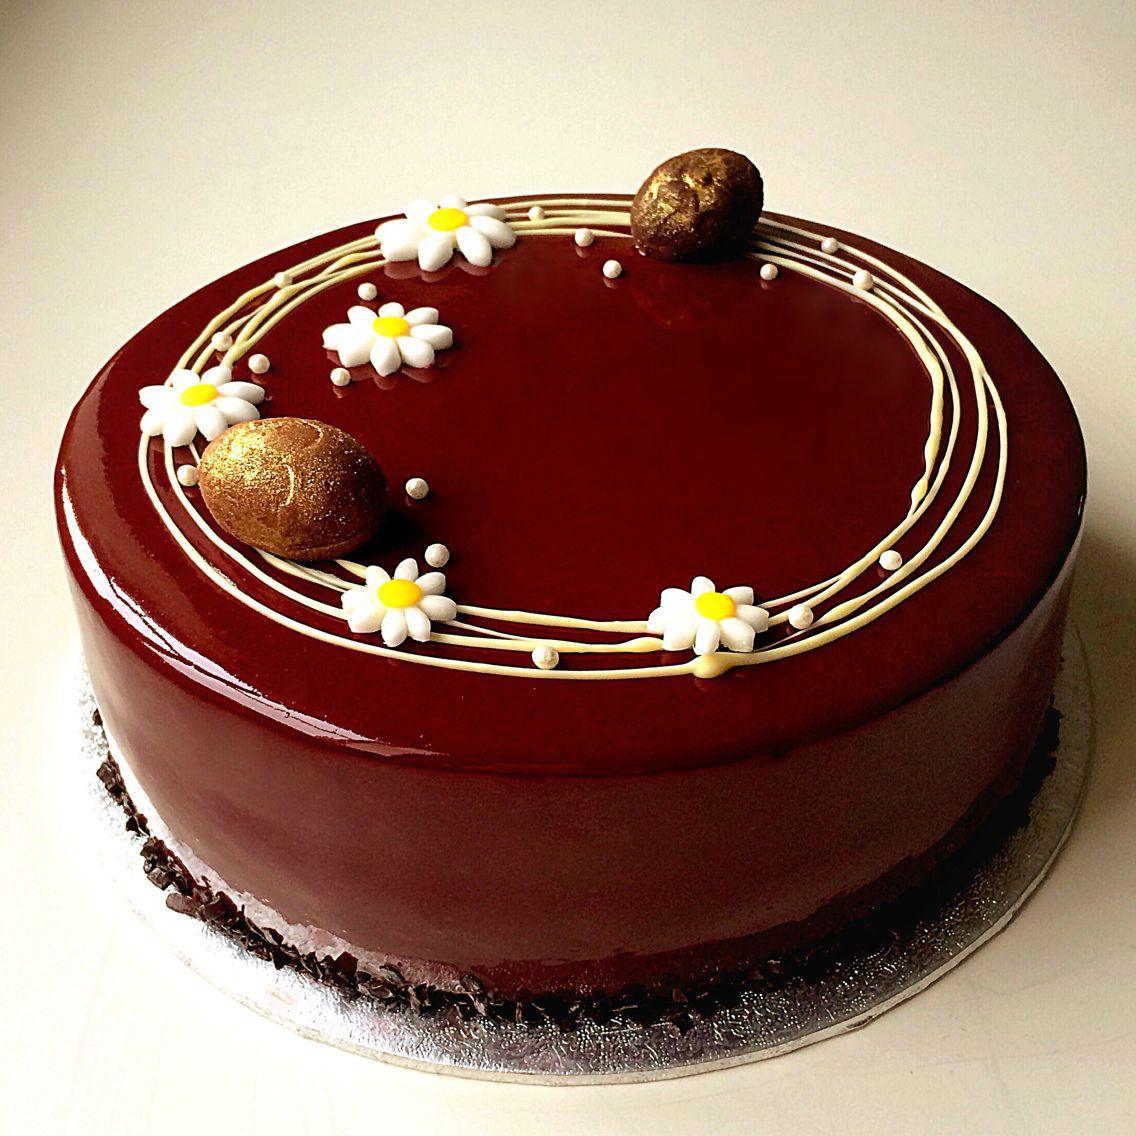 Chocolate Glaze Cake Decoration : Chocolate sponge cake layered with chocolate mousse ...